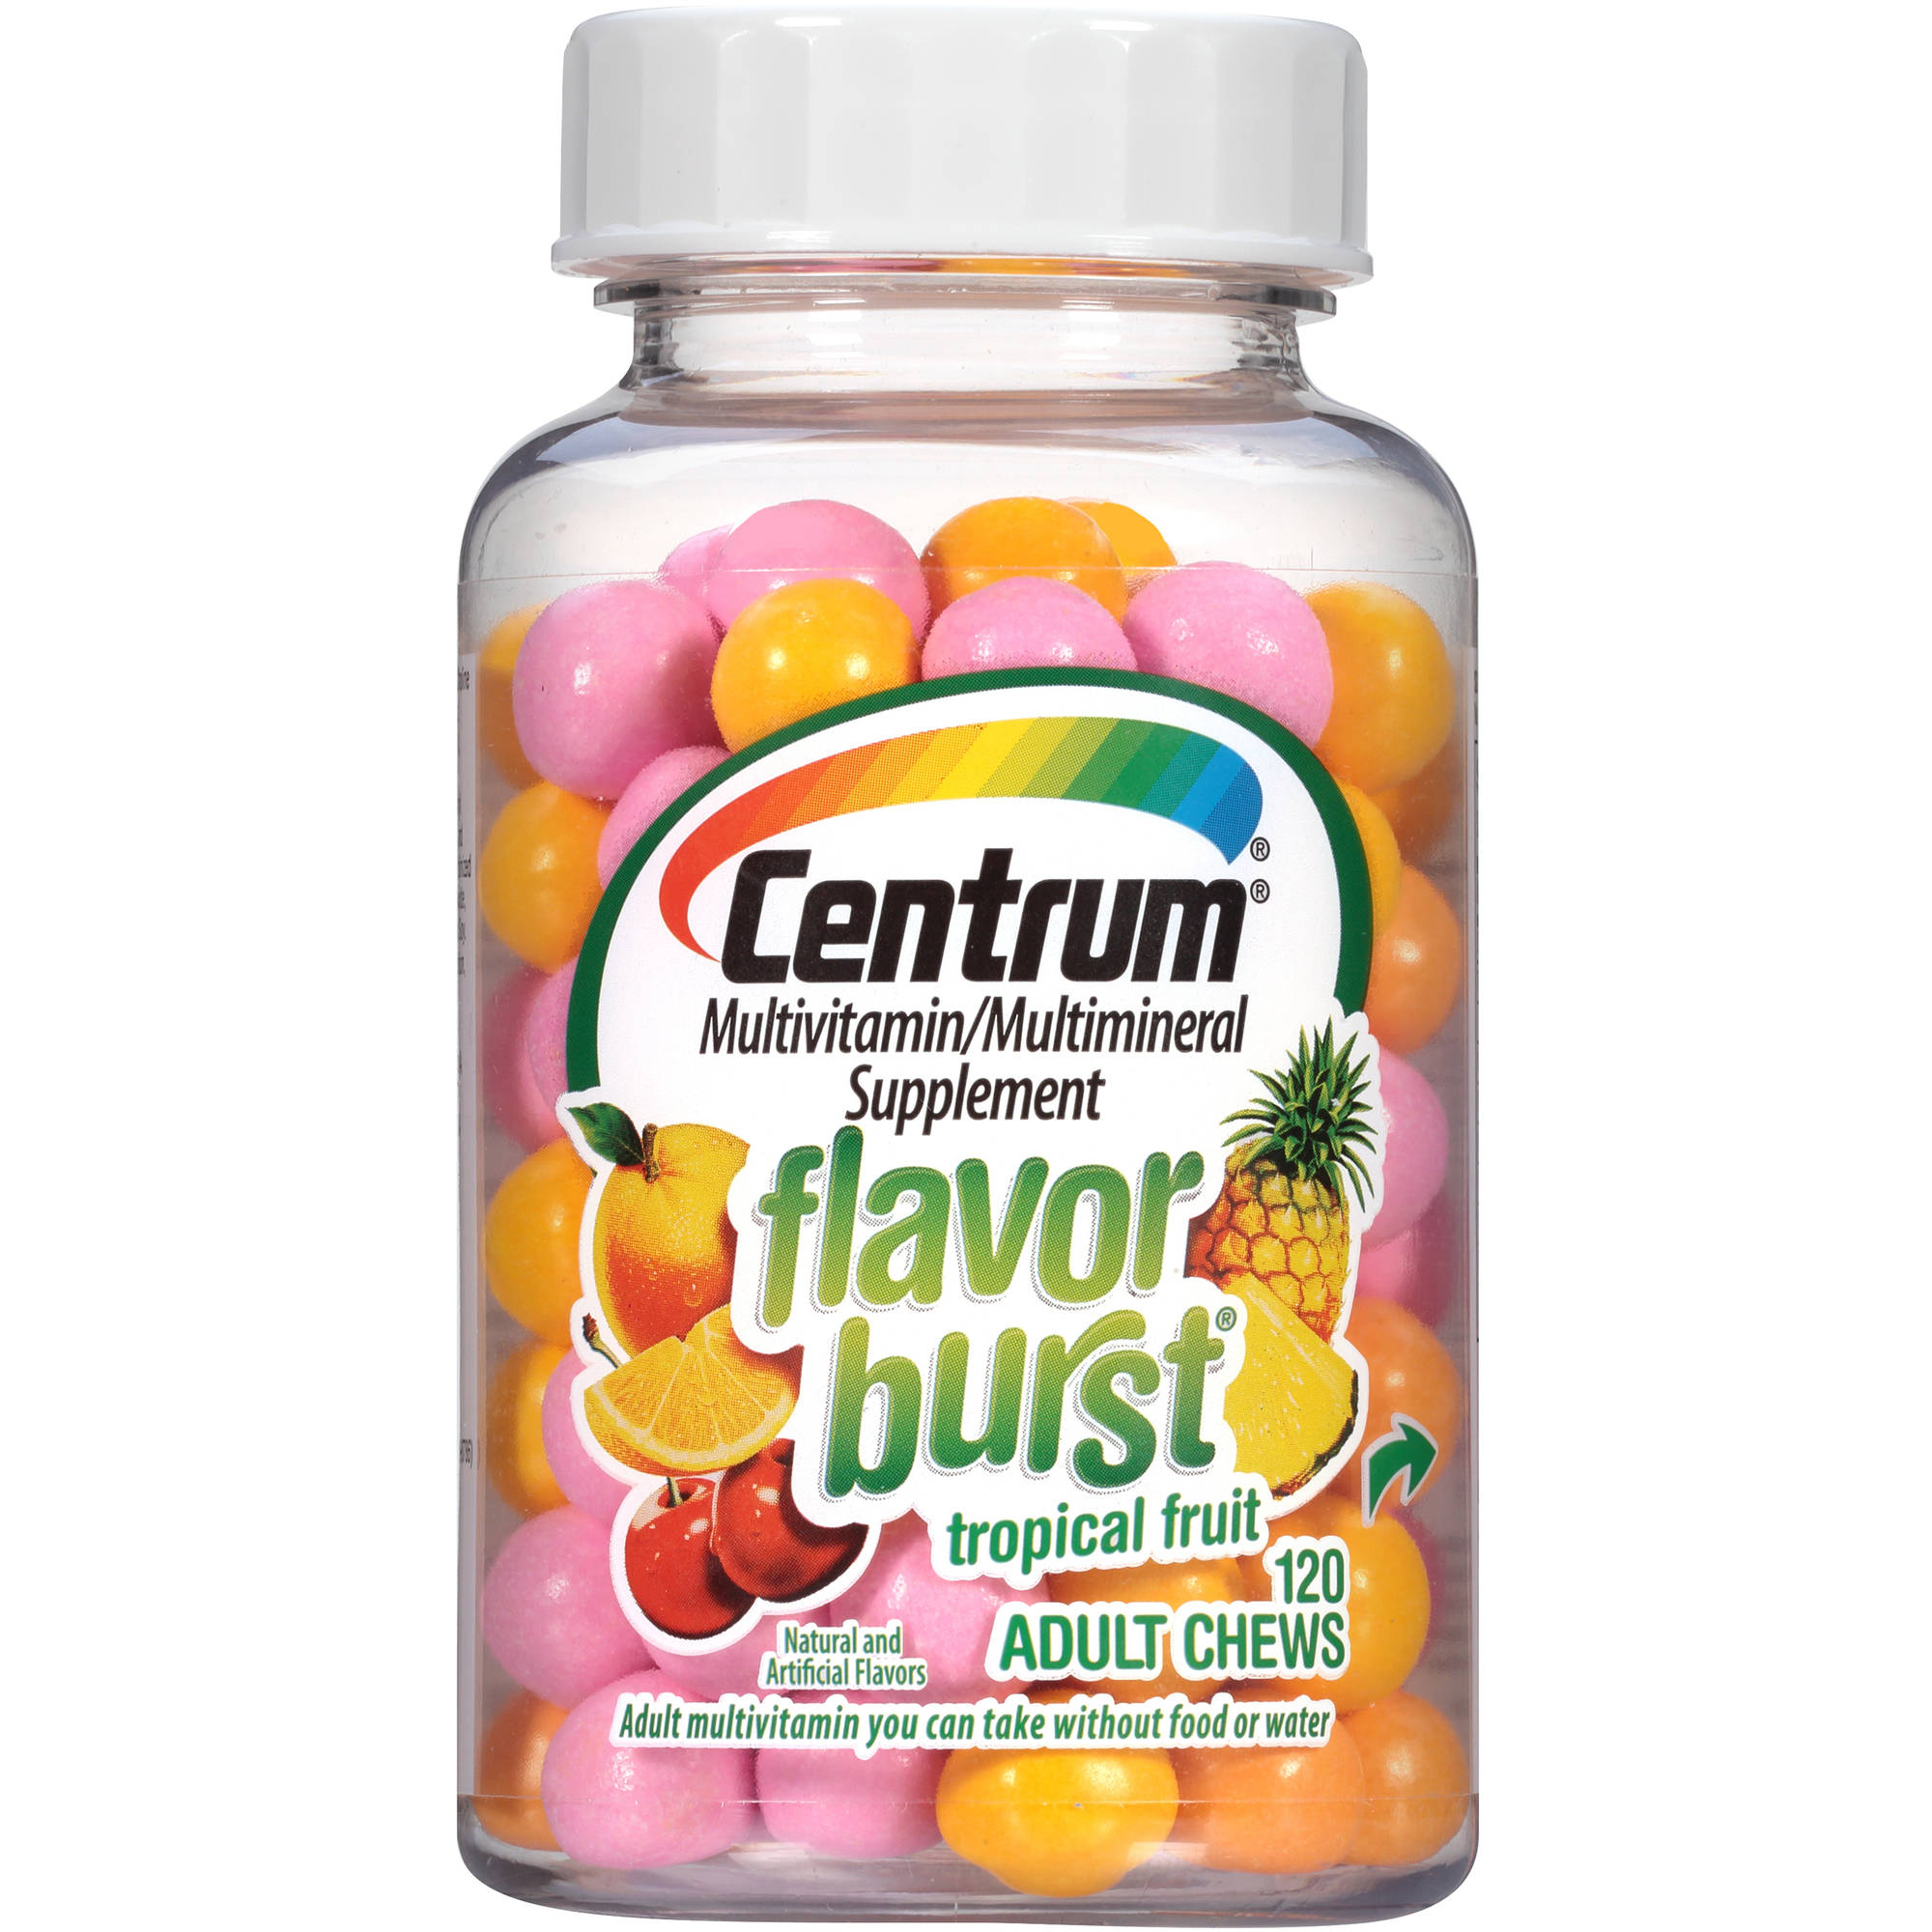 Centrum Flavor Burst Adult Multivitamin/Multimineral Supplement Chews in Tropical Fruit Flavor 120 Count